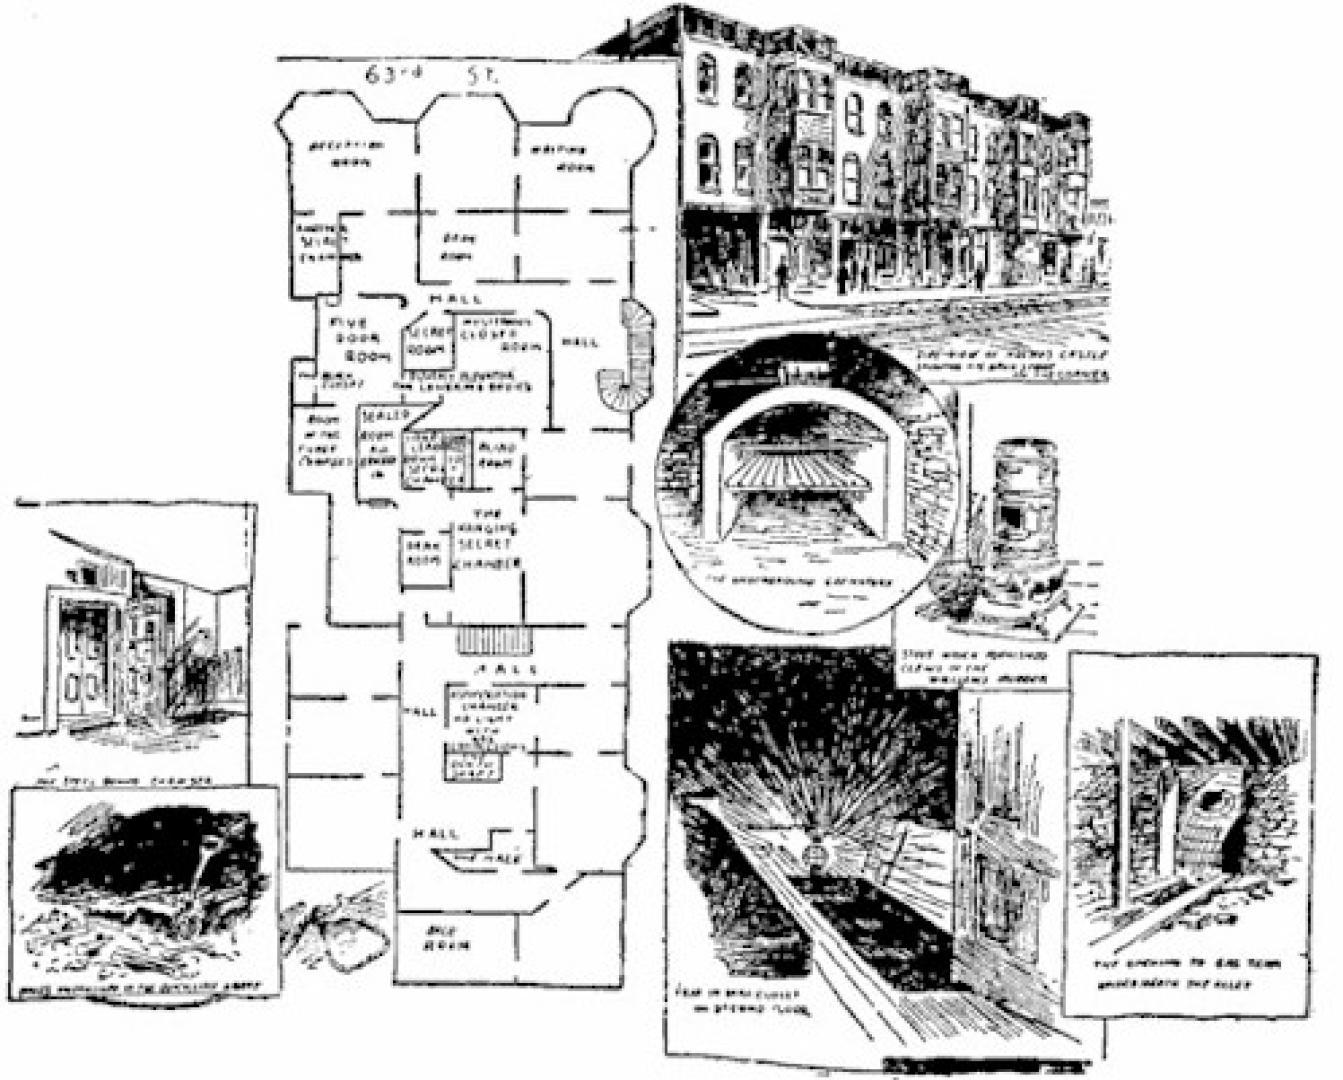 H. H. Holmes kastélya 2. kép